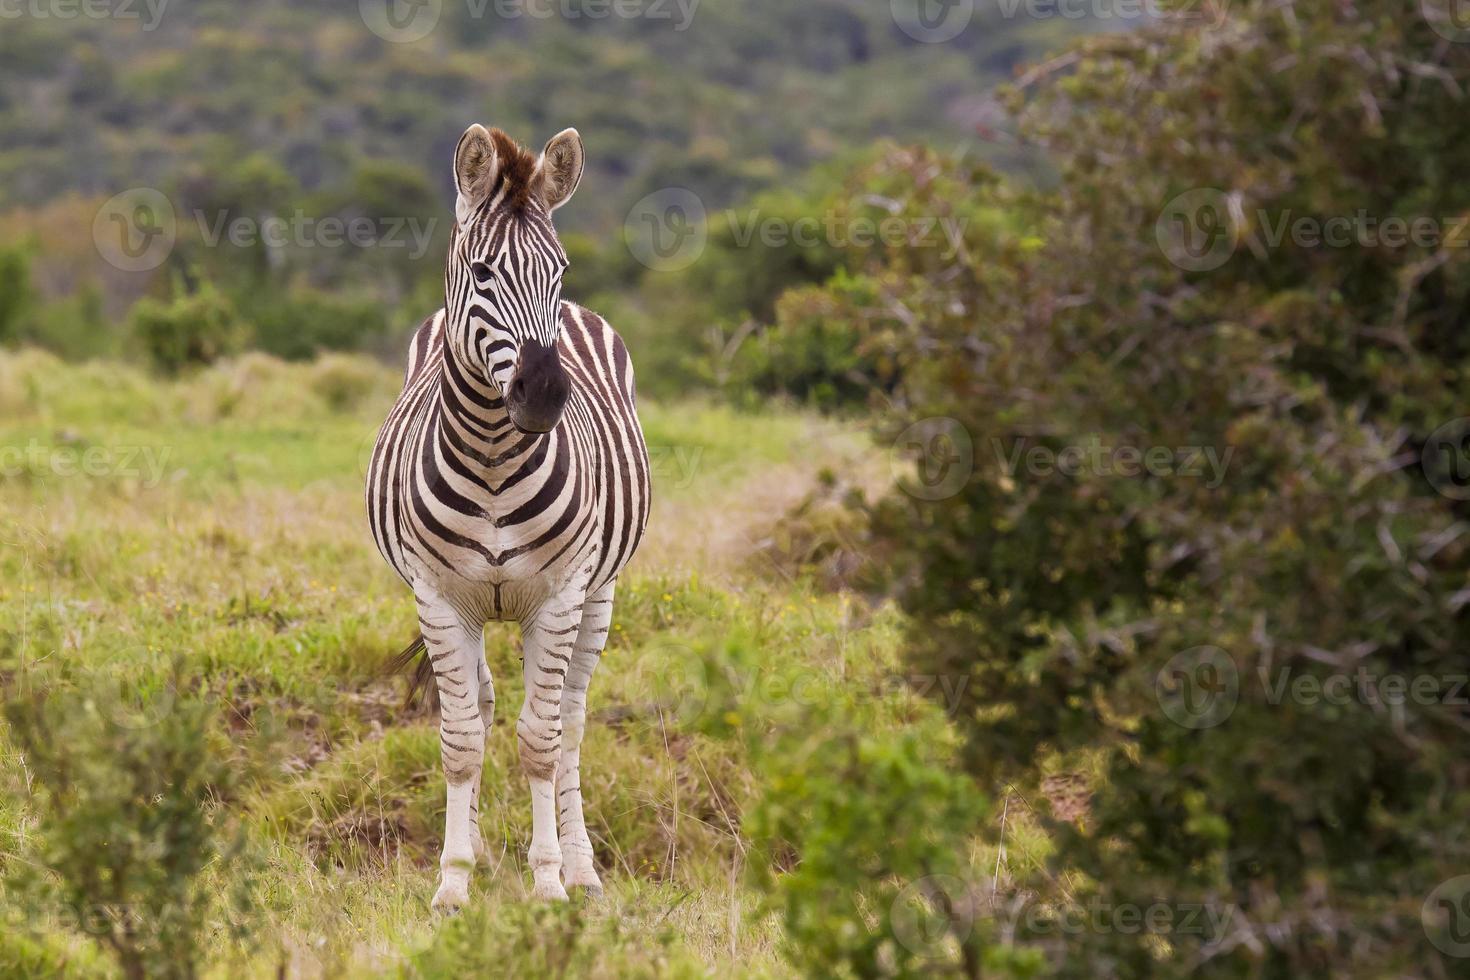 Zebra standing close to a thorn bush photo